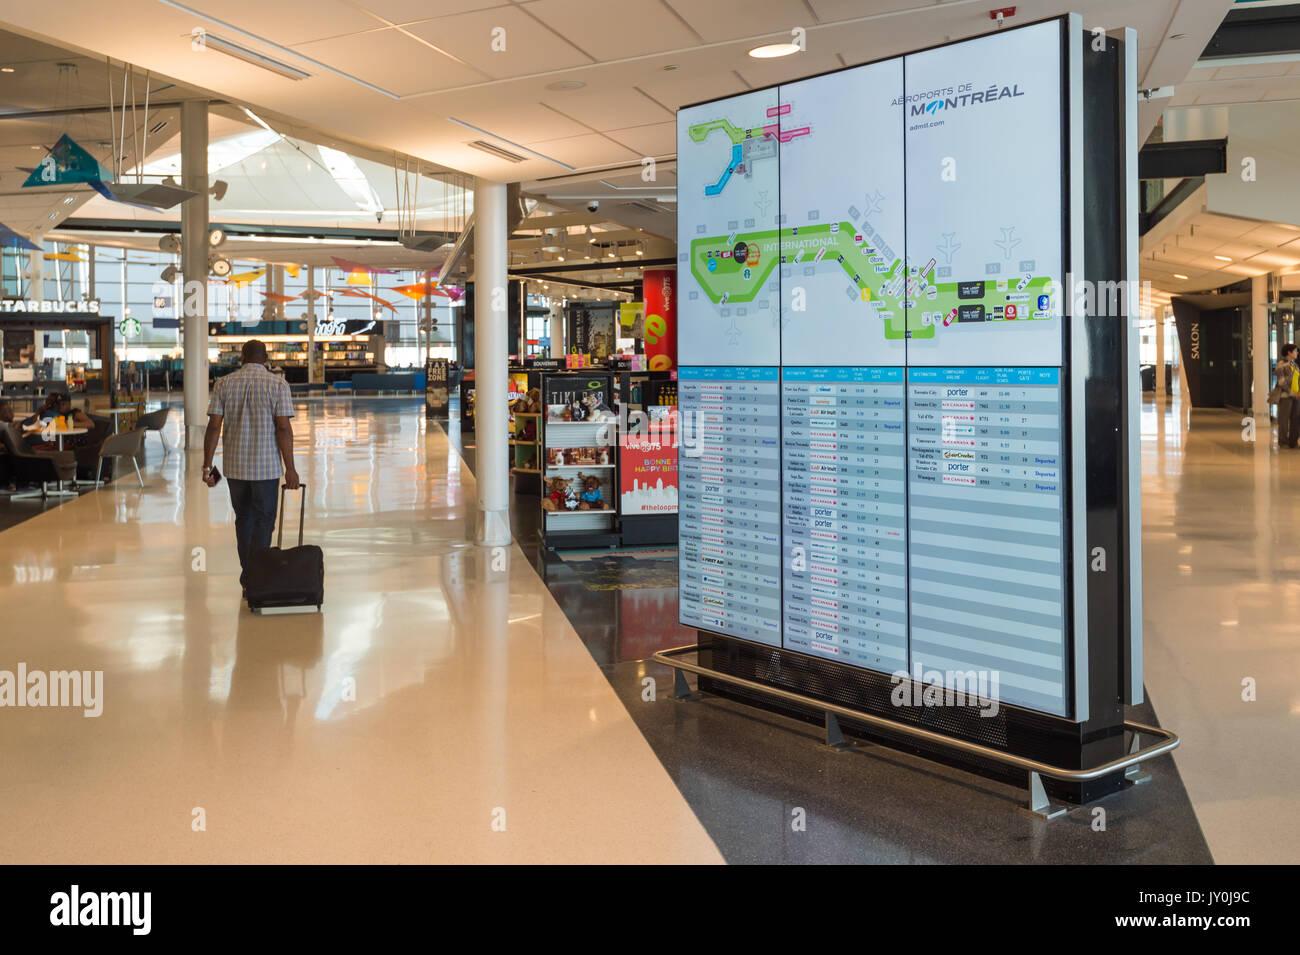 Departure hall and display board Inside Montreal Pierre Elliott Trudeau International Airport - Stock Image